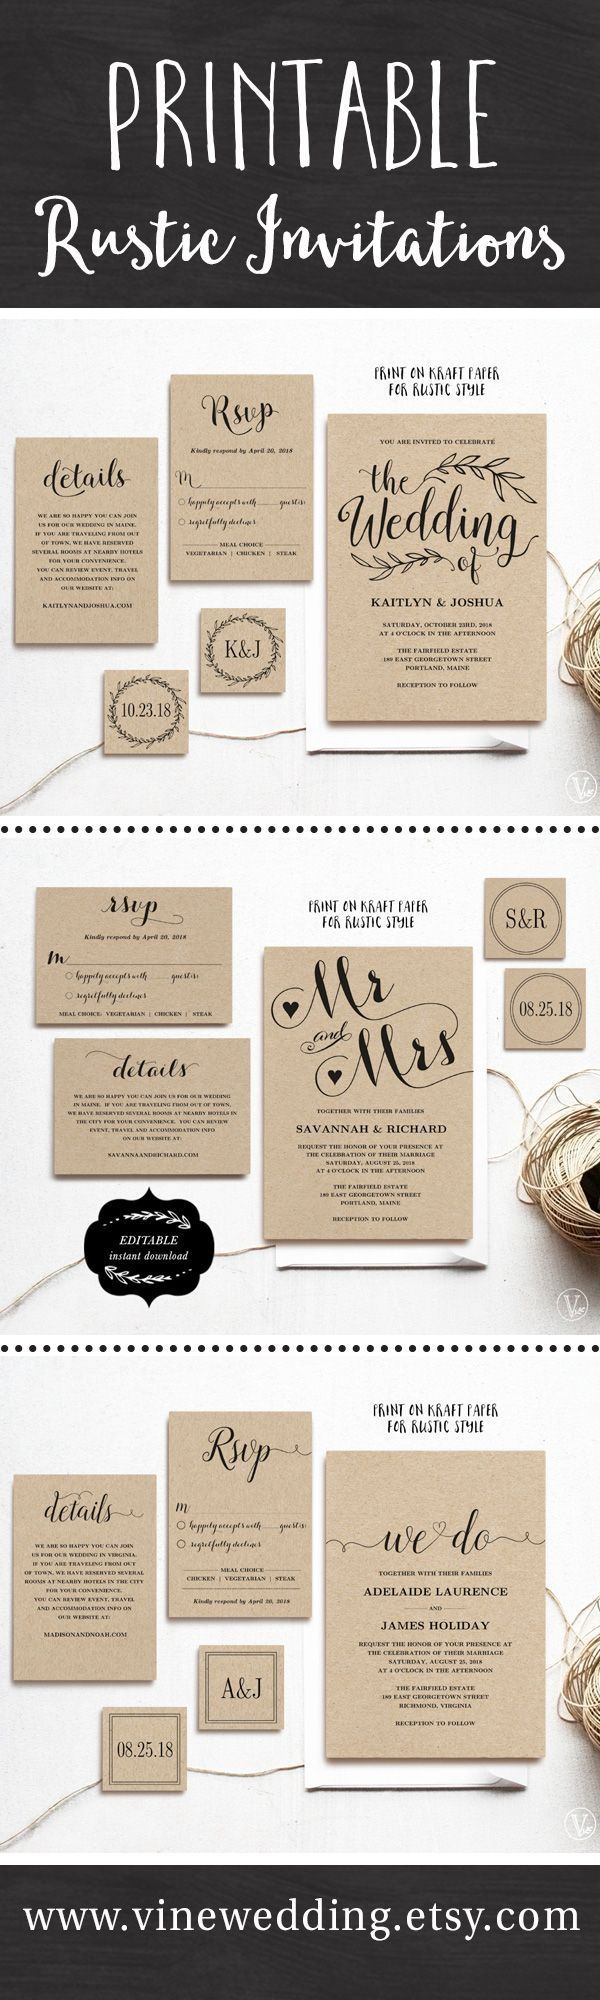 nice diy wedding invitations best photos | Wedding Invitation ...